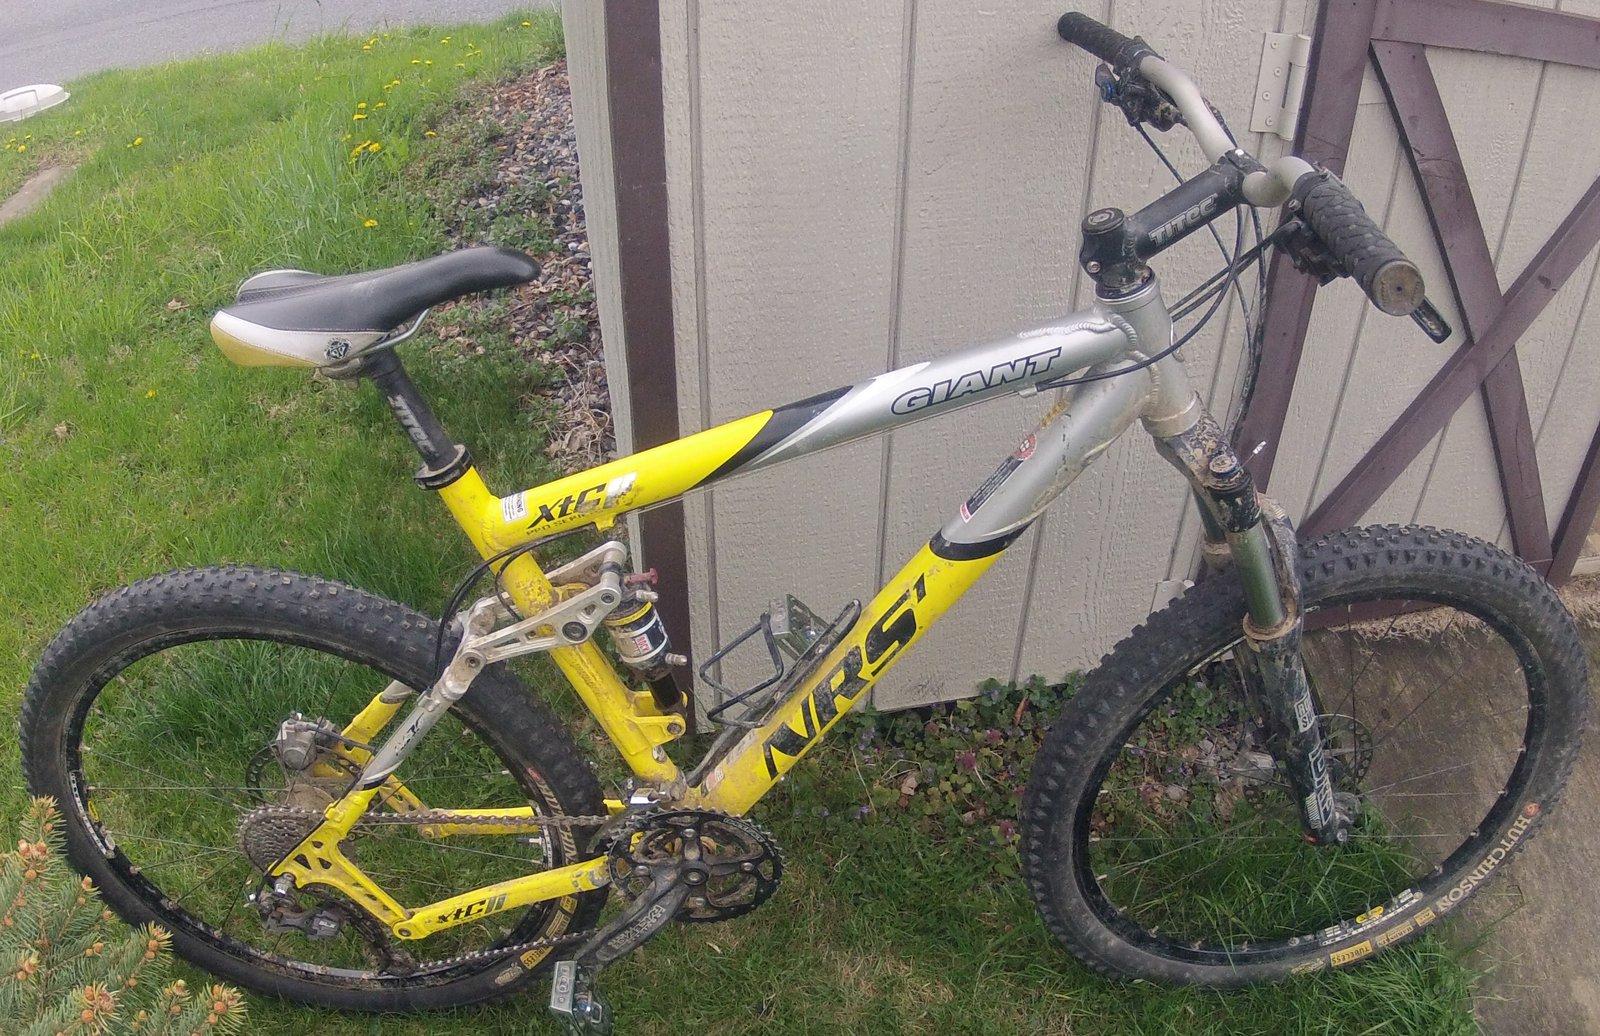 Giant NRS 1 xtc mountain bike